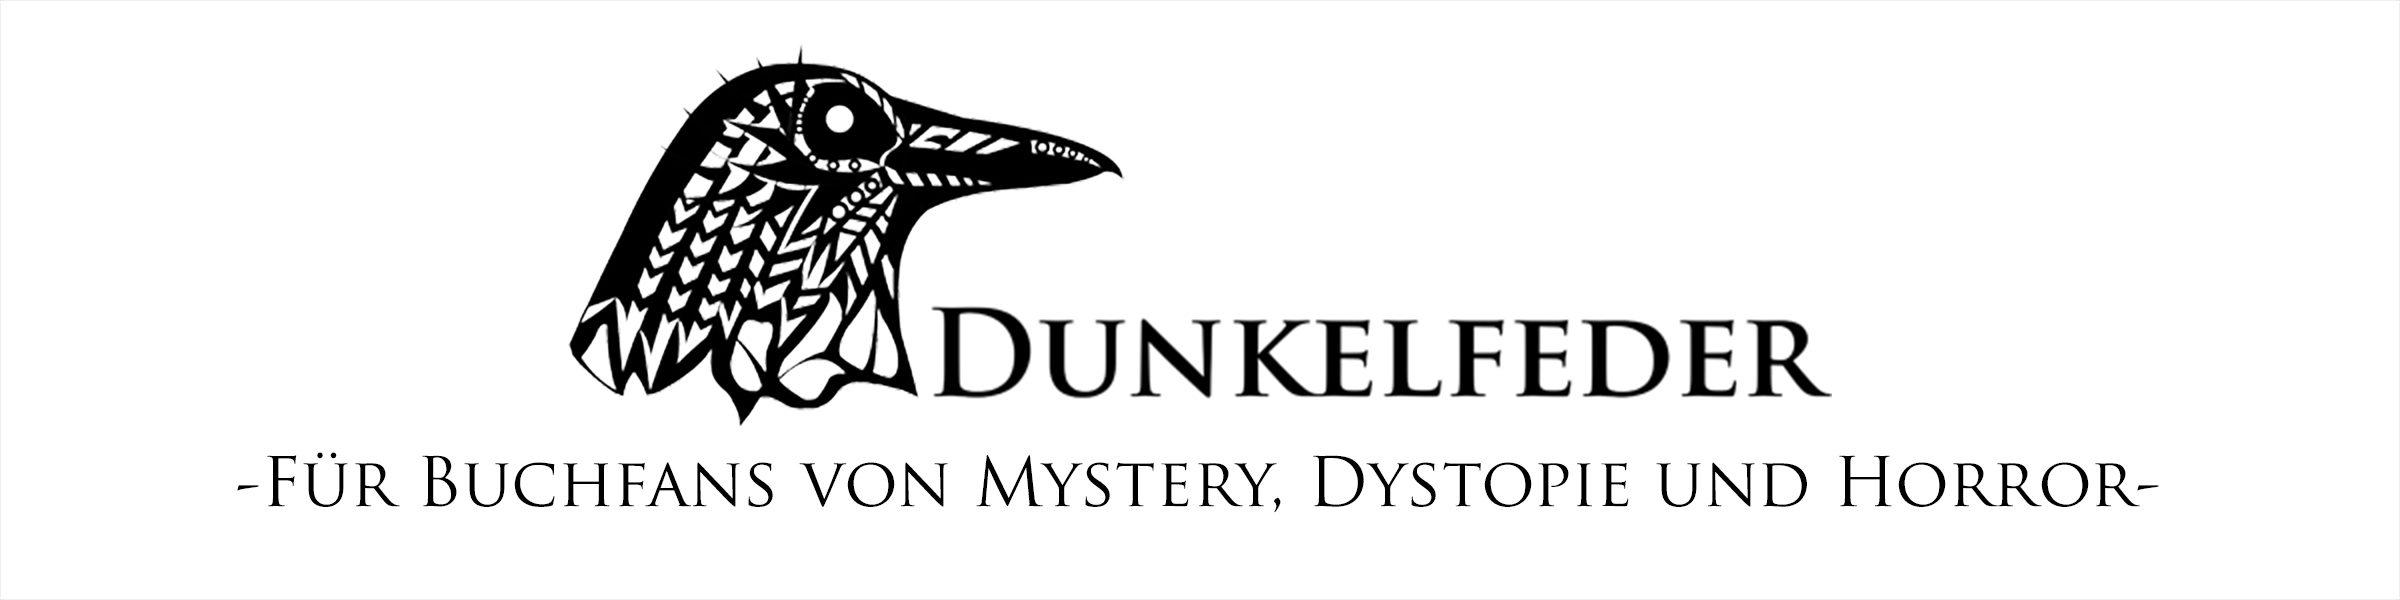 Dunkelfeder